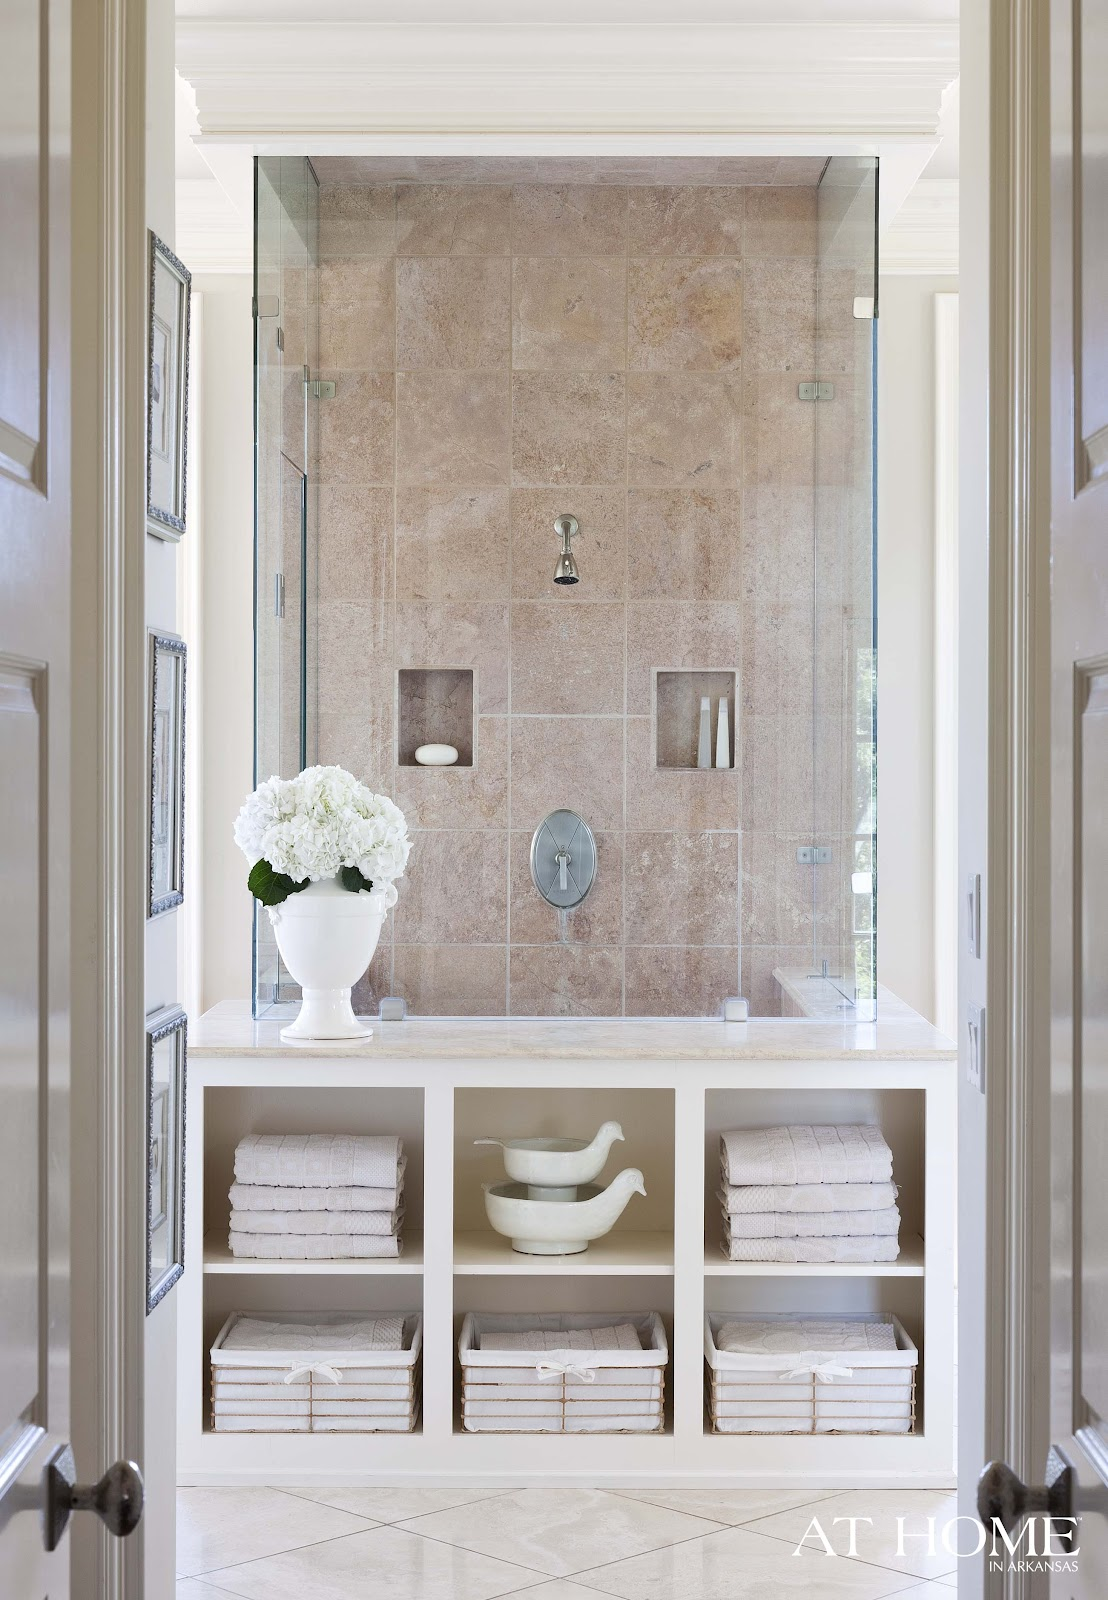 to da loos creamy dreamy master bathroom spa. Black Bedroom Furniture Sets. Home Design Ideas